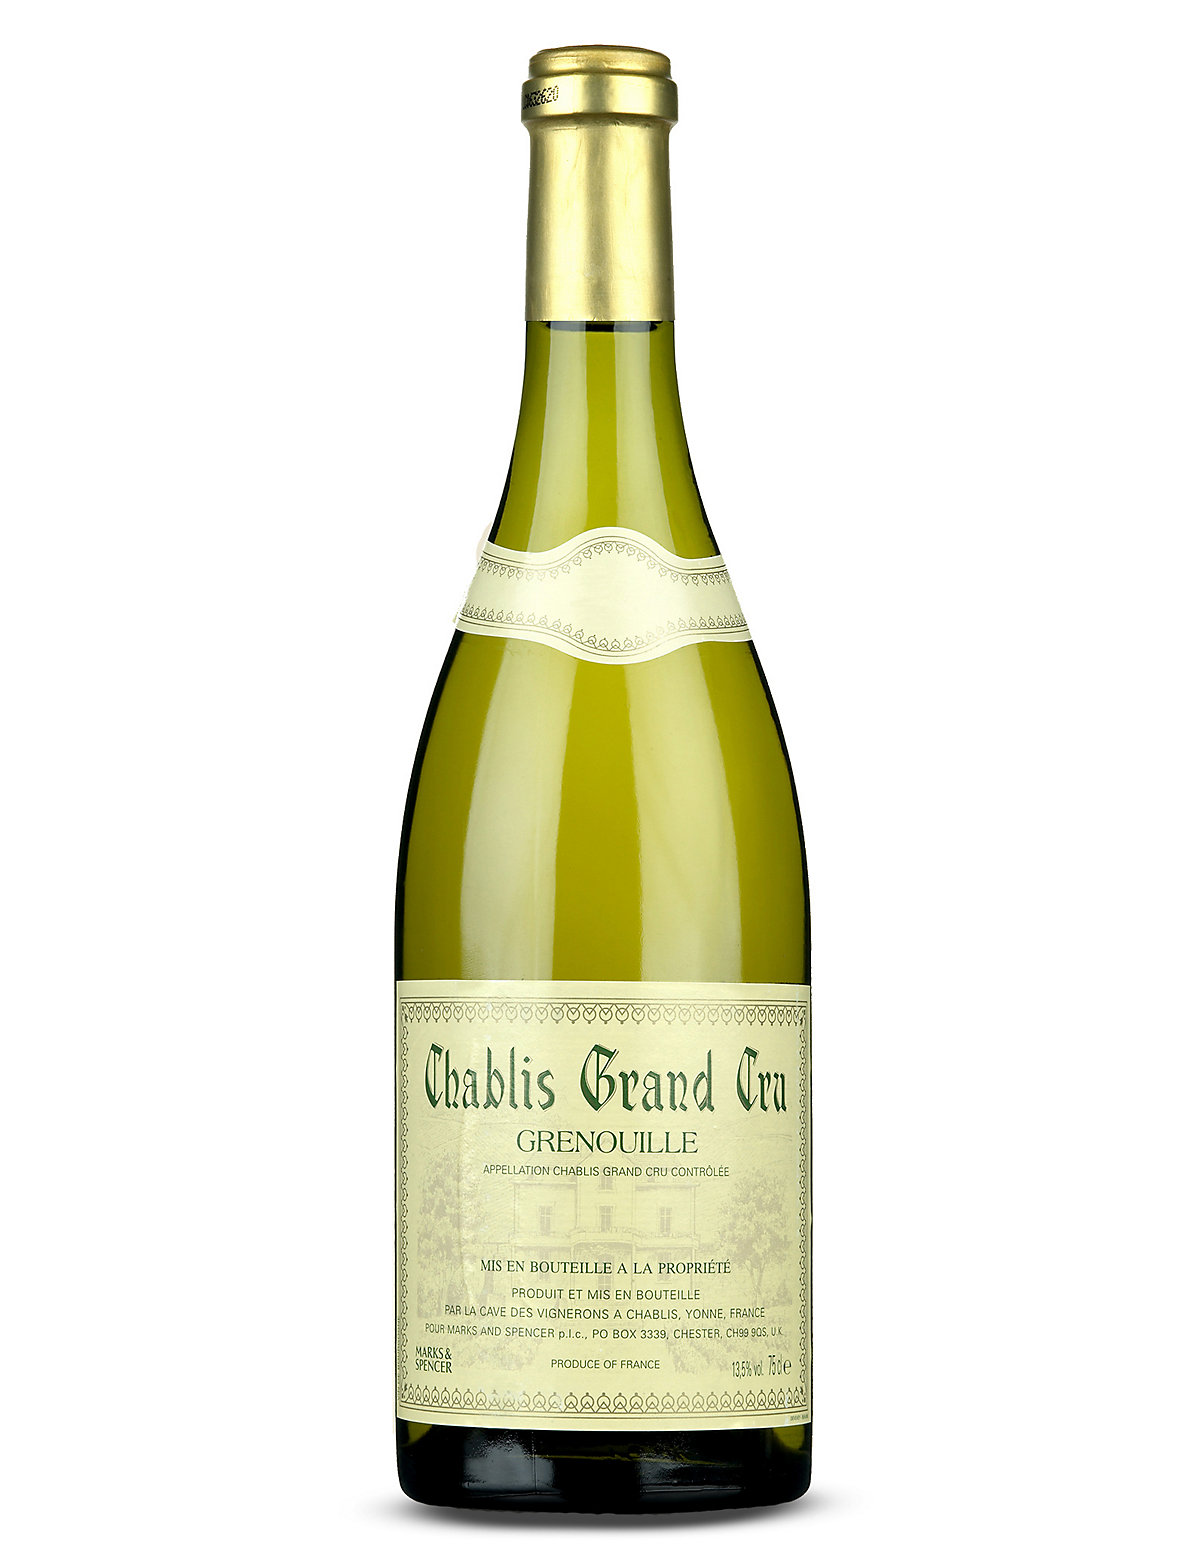 Chablis Grand Cru Grenouille - Single Bottle